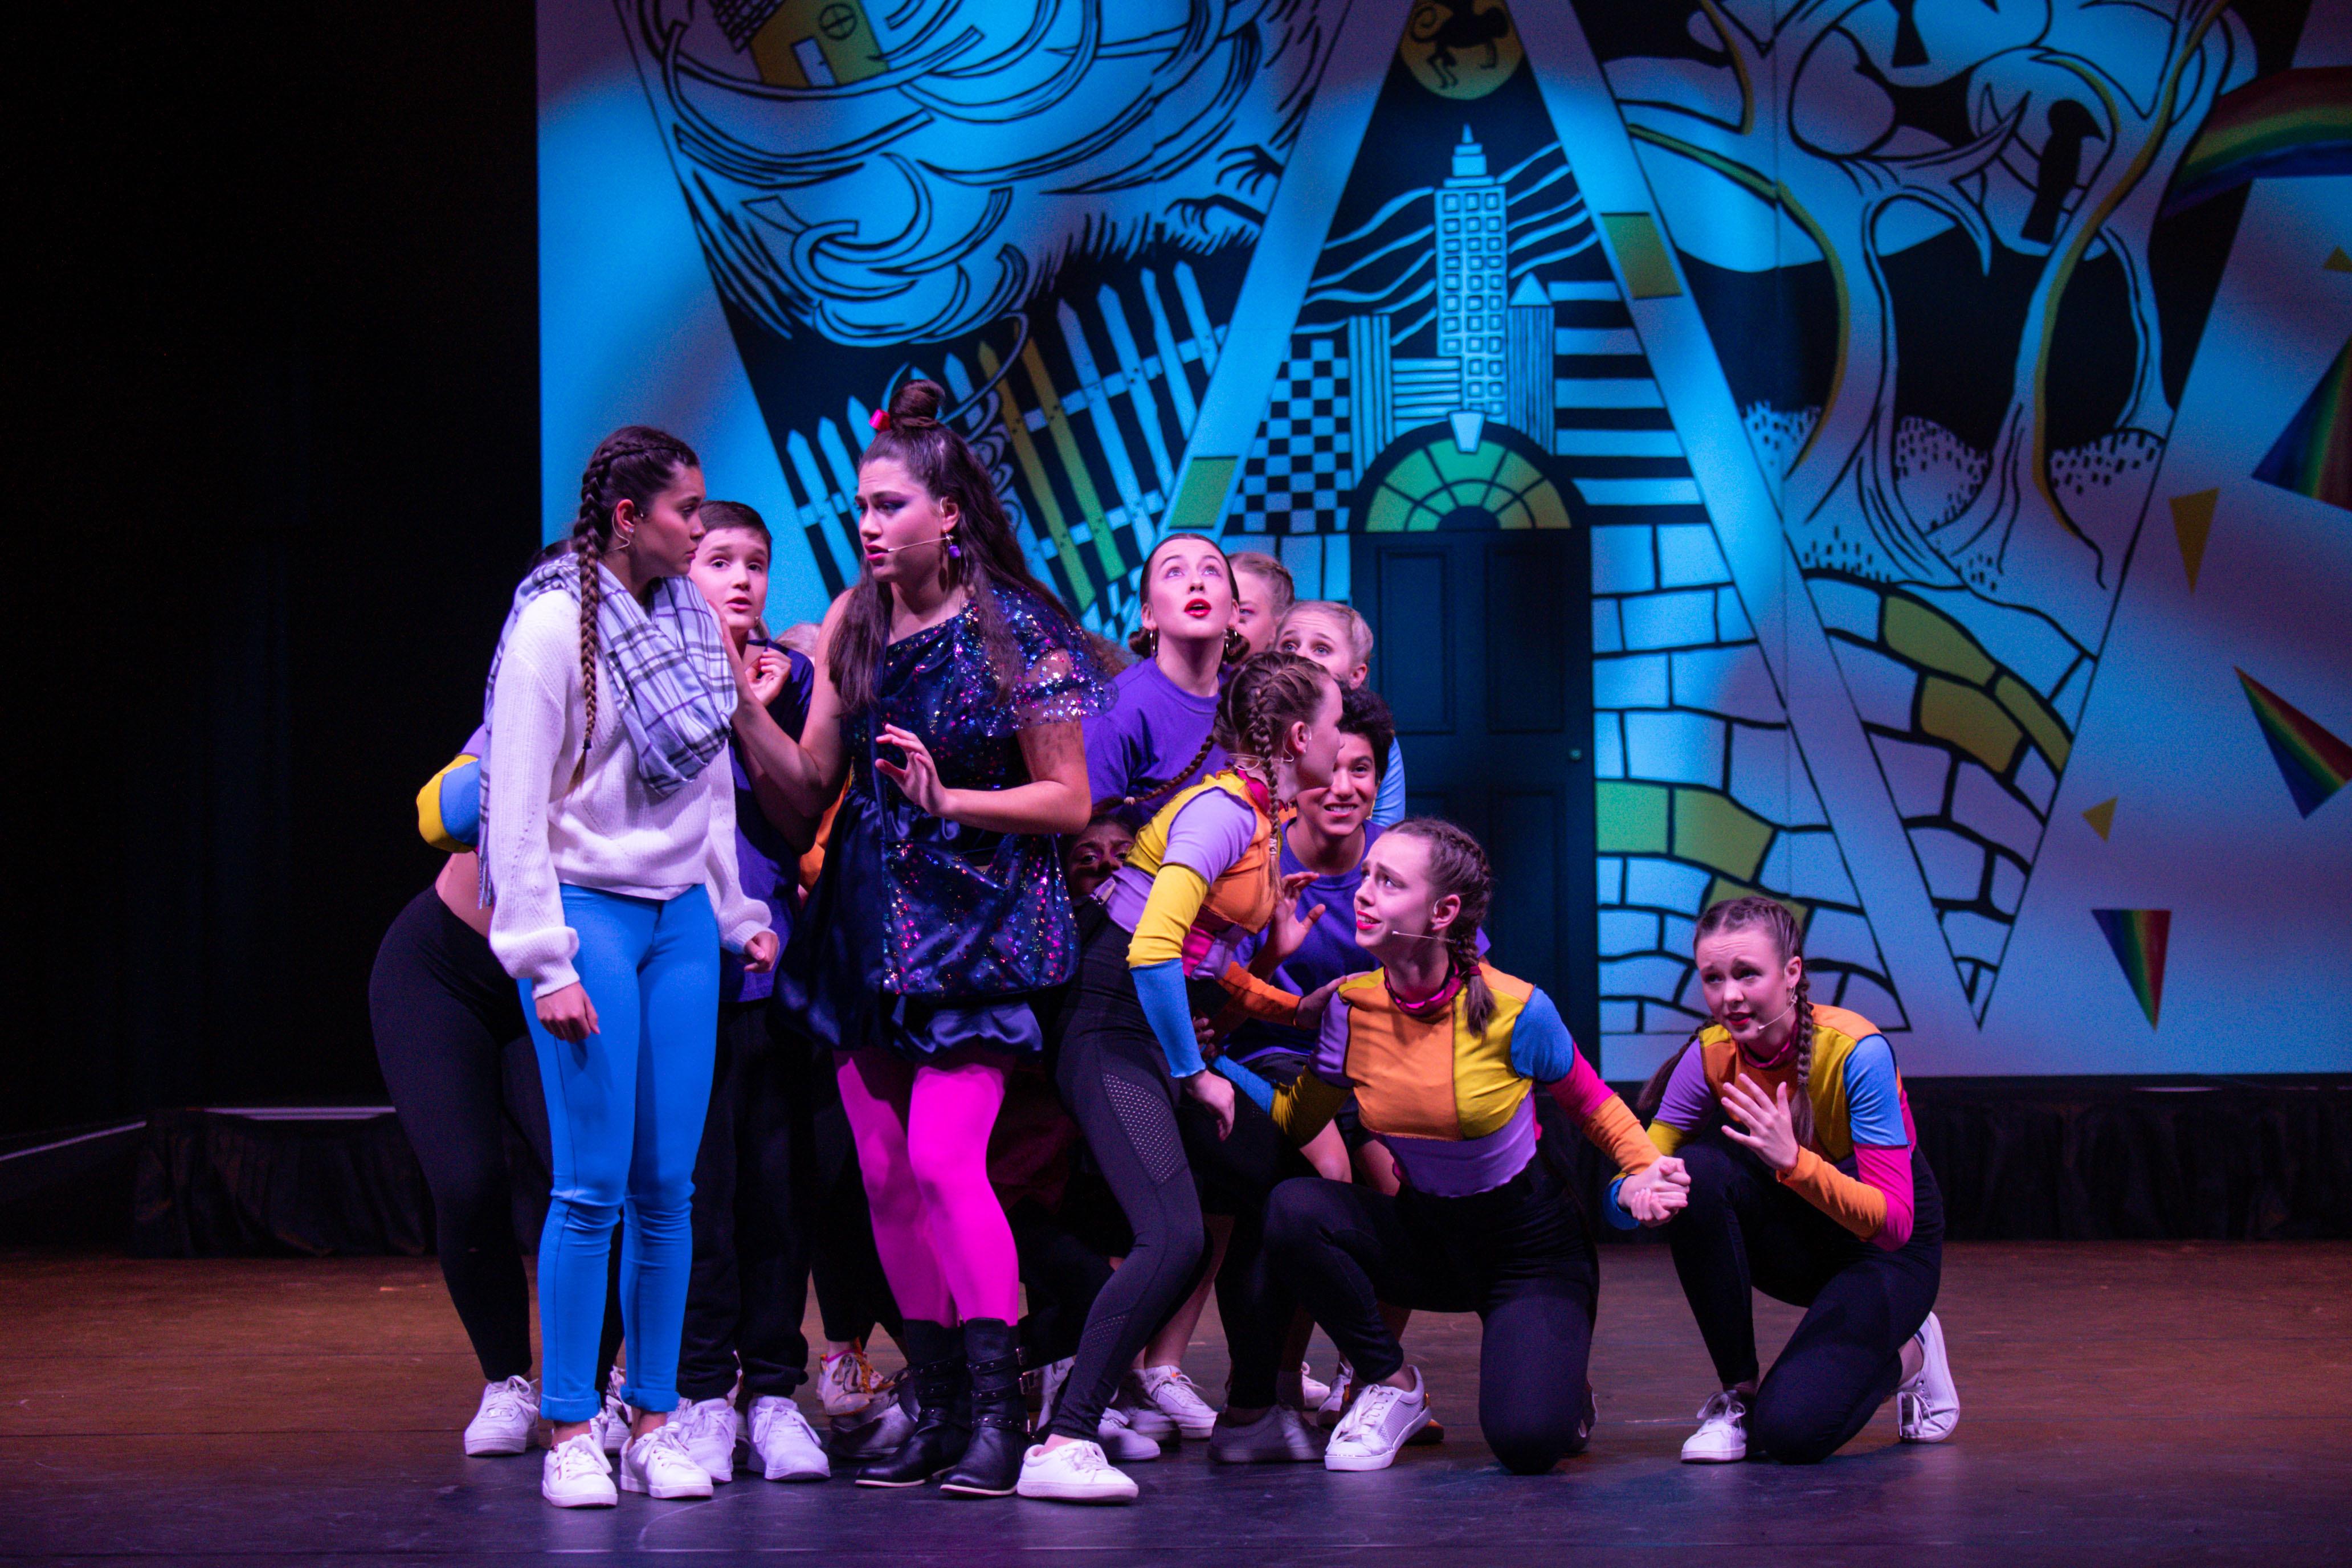 Drama, Dance and the Arts